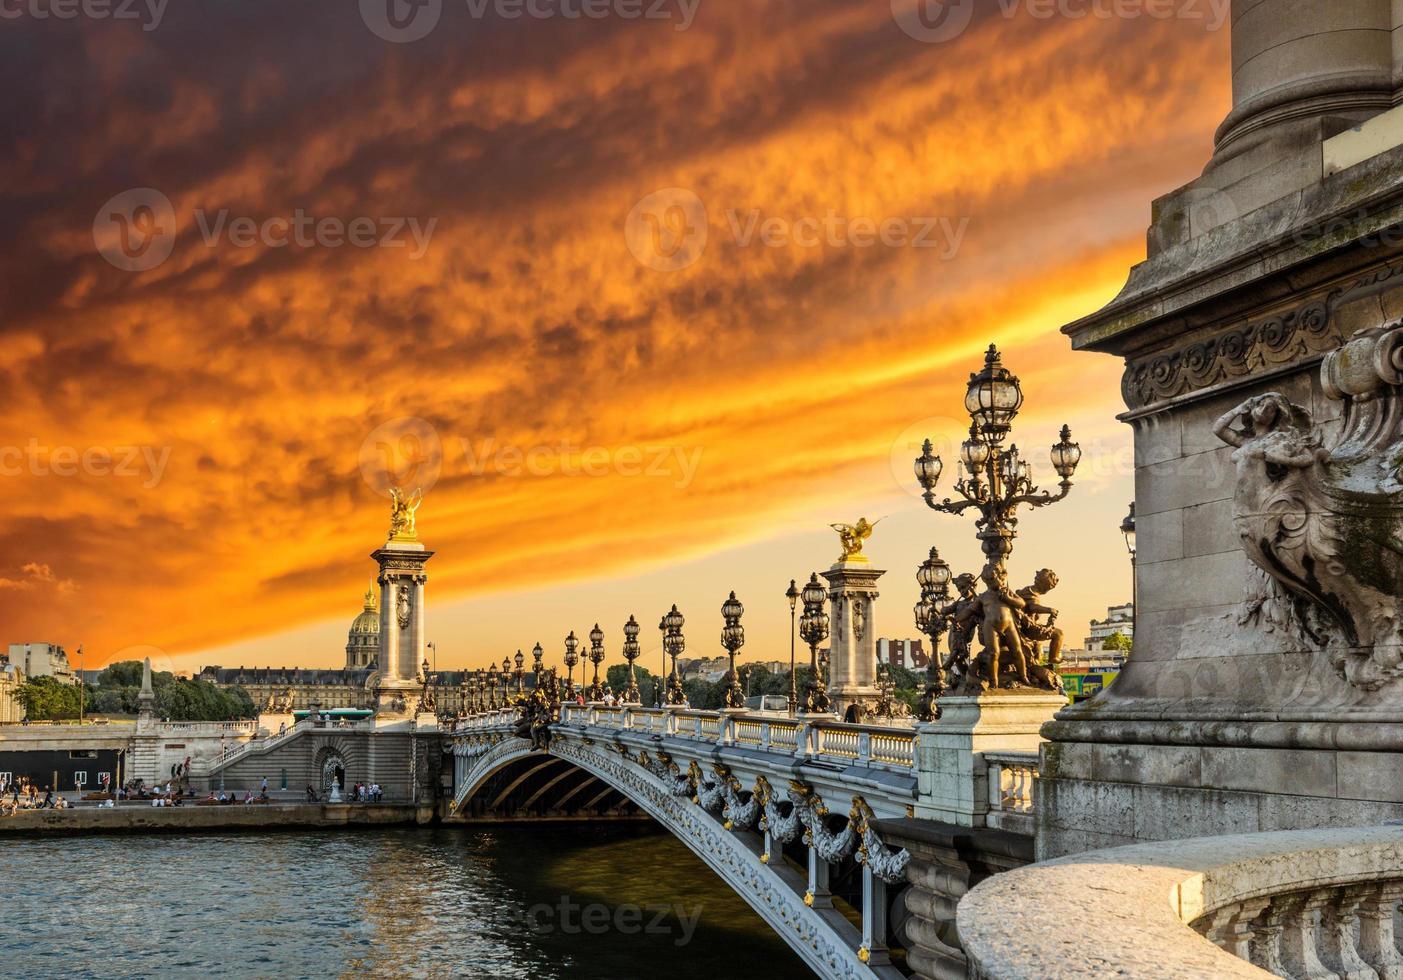 fantastischer Sonnenuntergang über der Alexandre III Brücke (Pont Alexandre III) foto